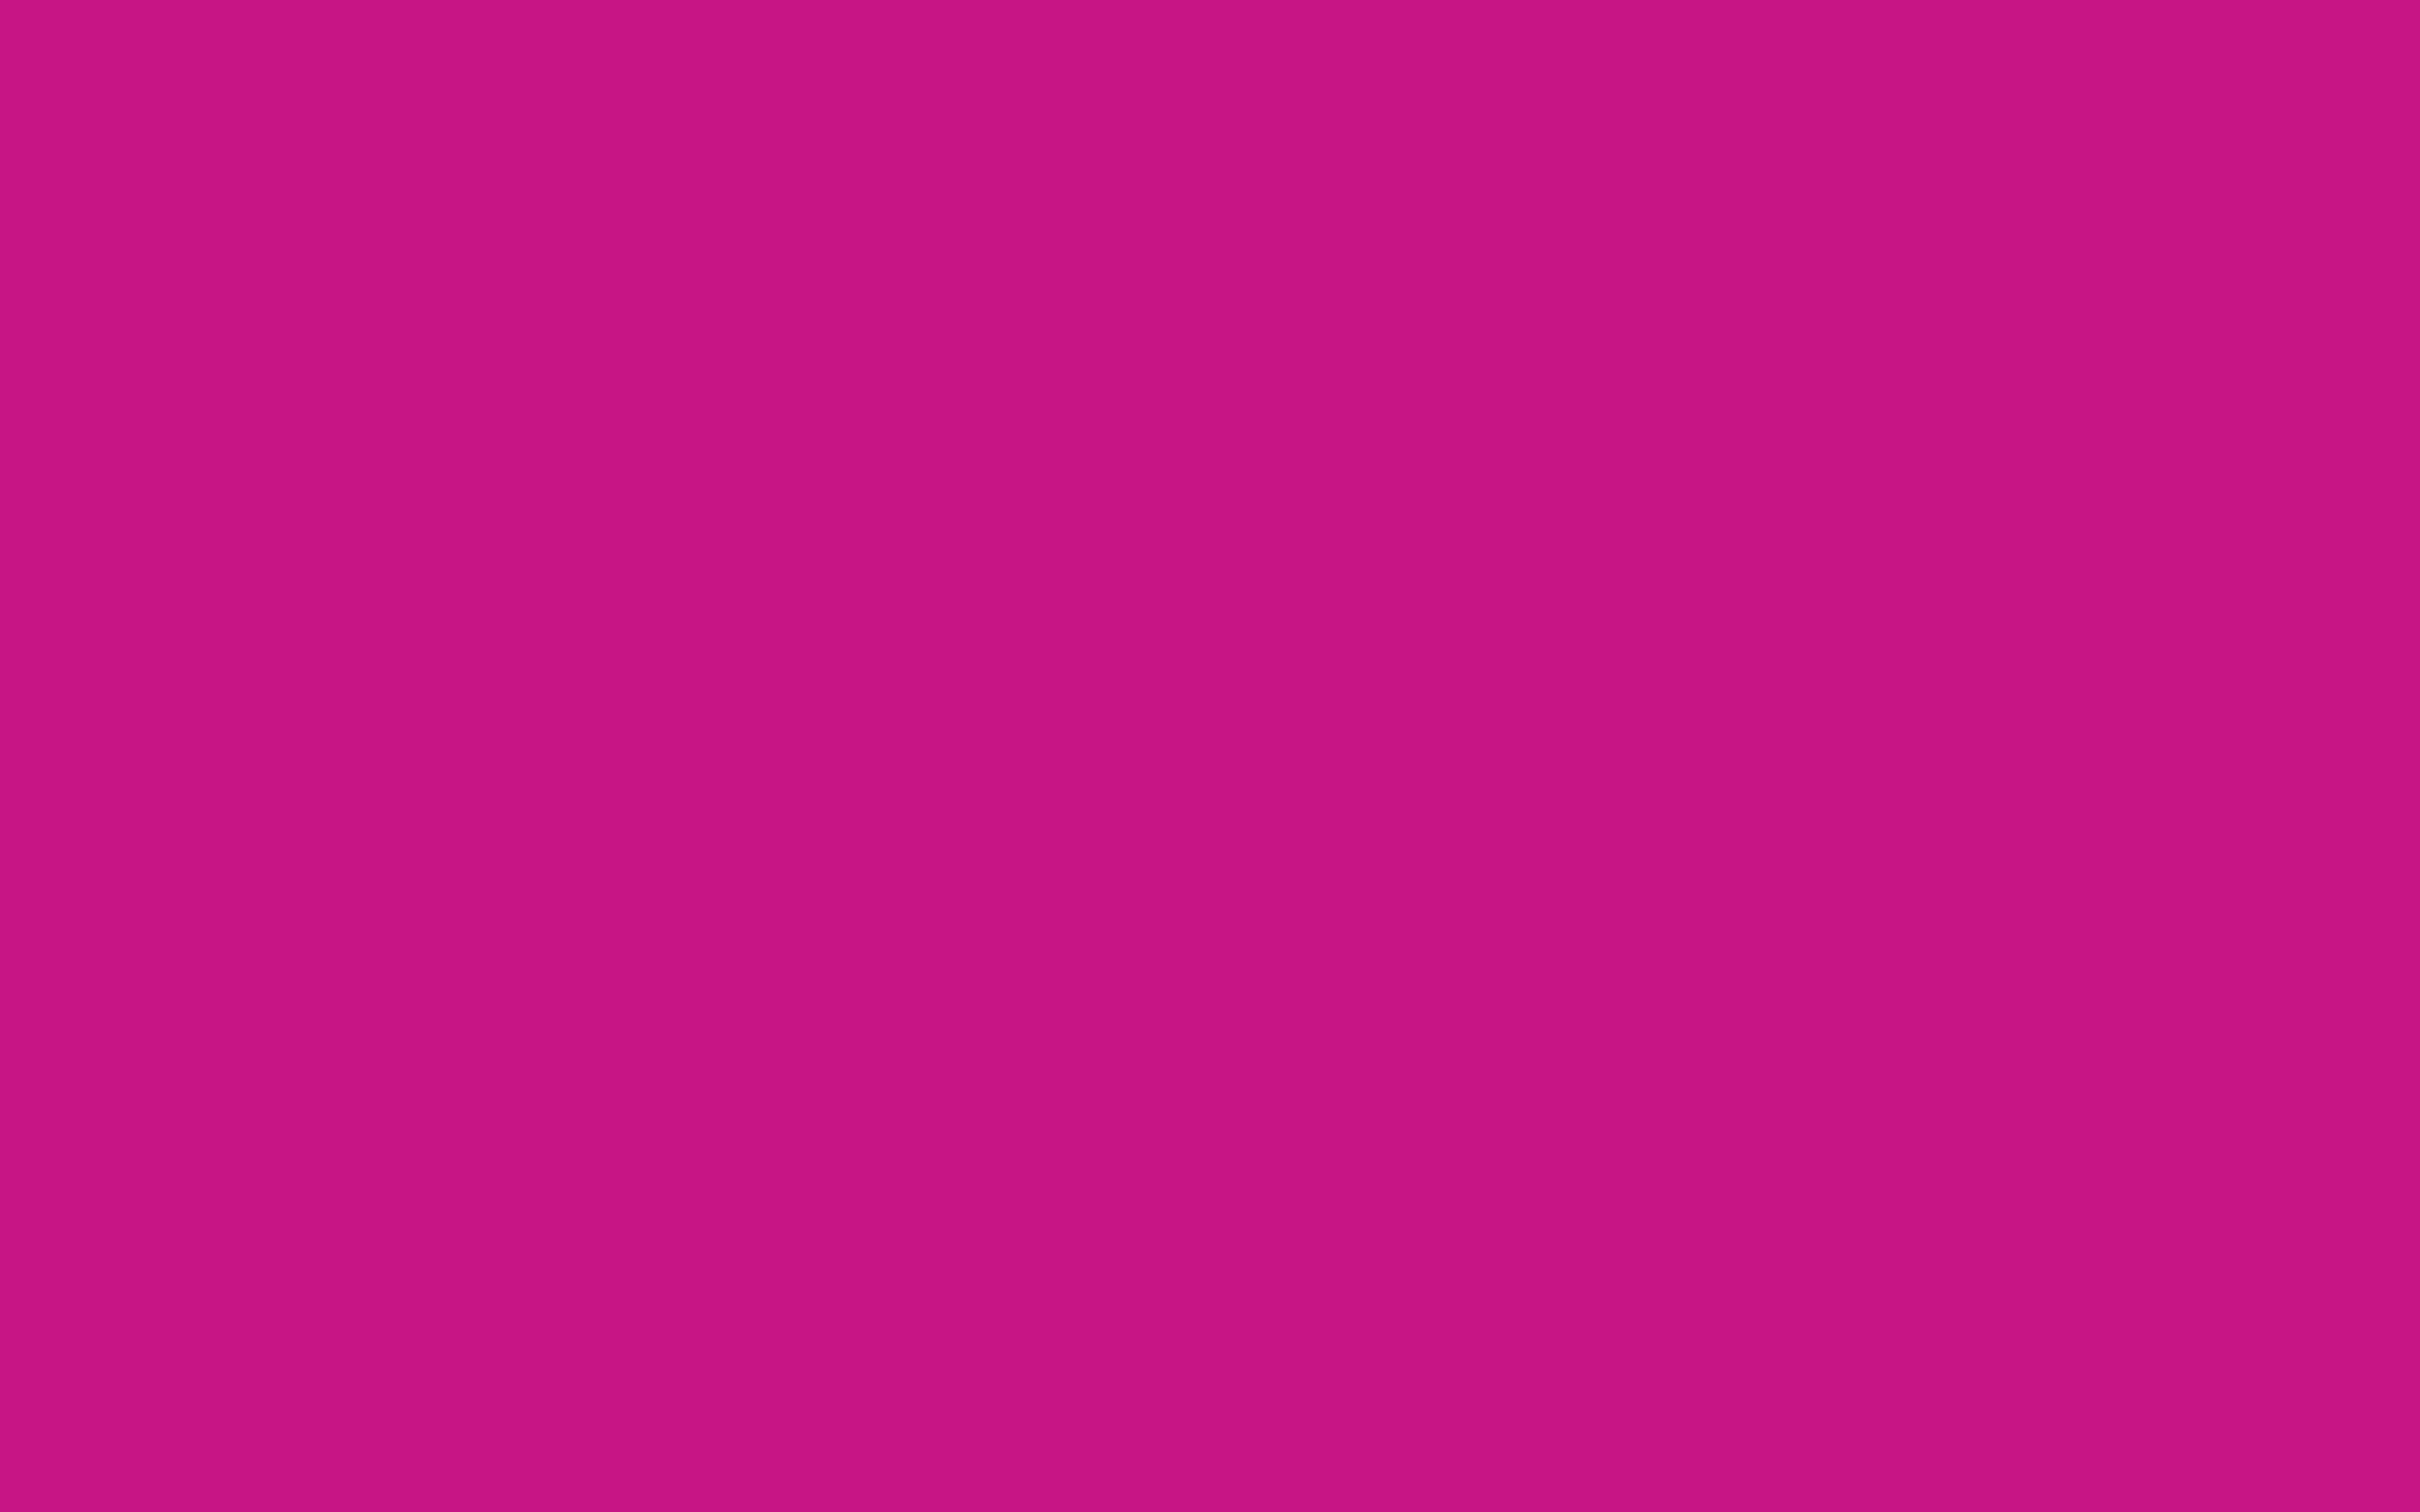 2560x1600 Medium Violetred Solid Color Background